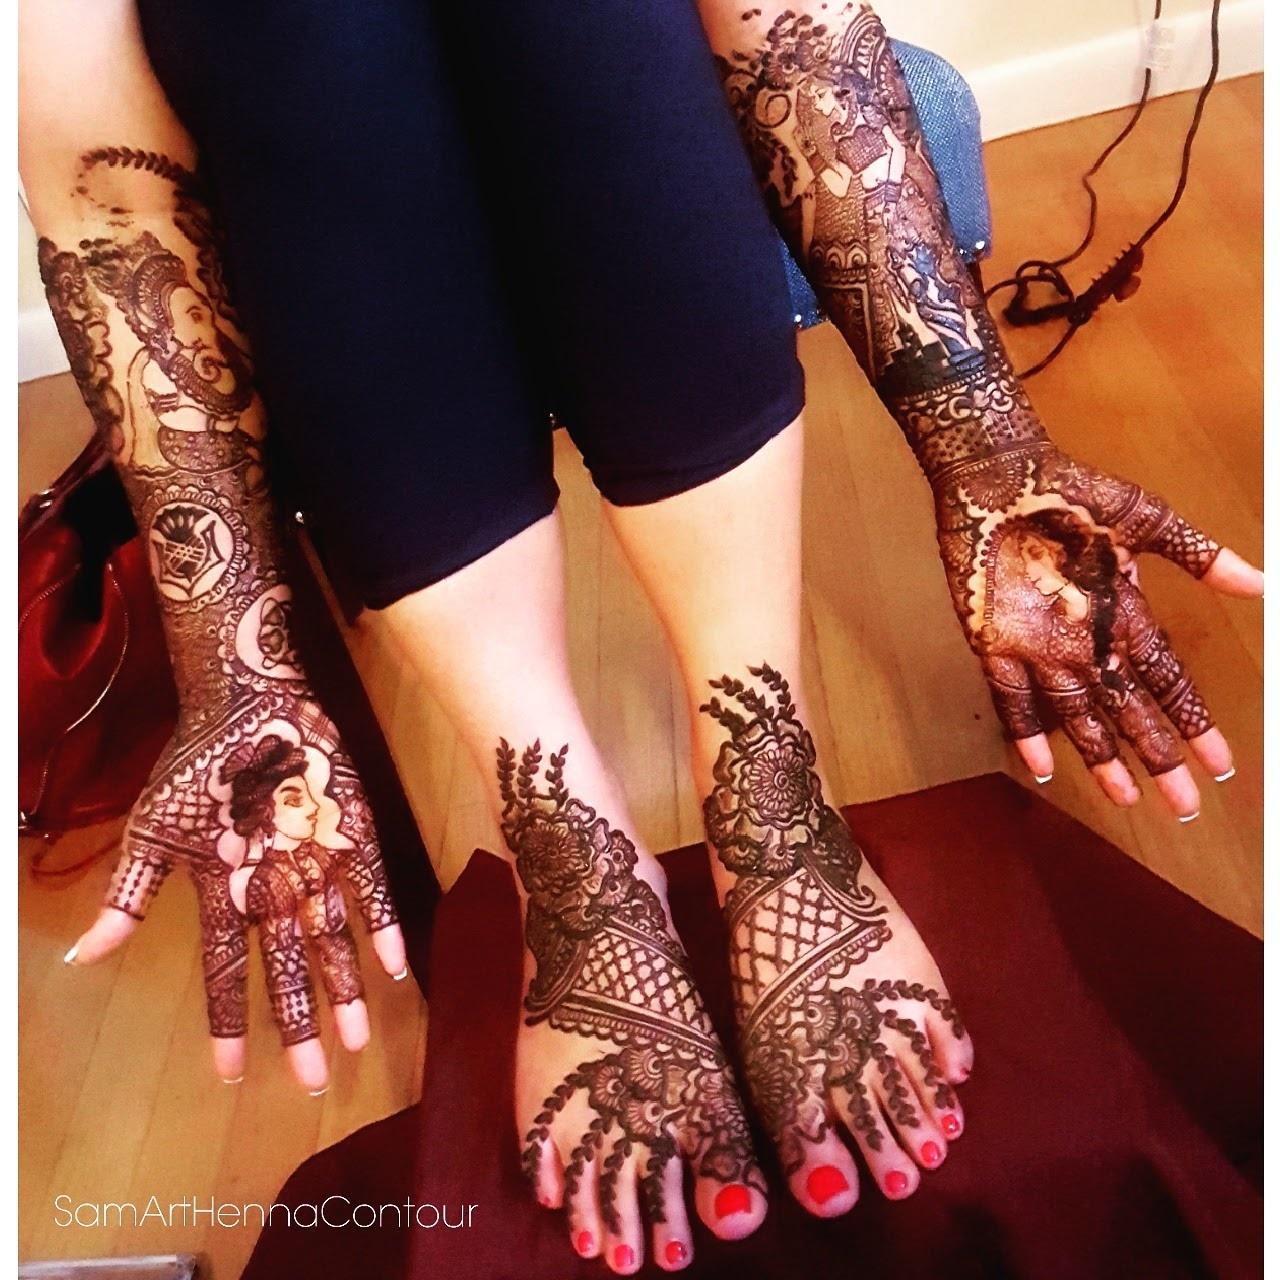 https://0201.nccdn.net/1_2/000/000/0dc/0d3/bespoke-Bridal-Henna----360-1280x1280.jpg